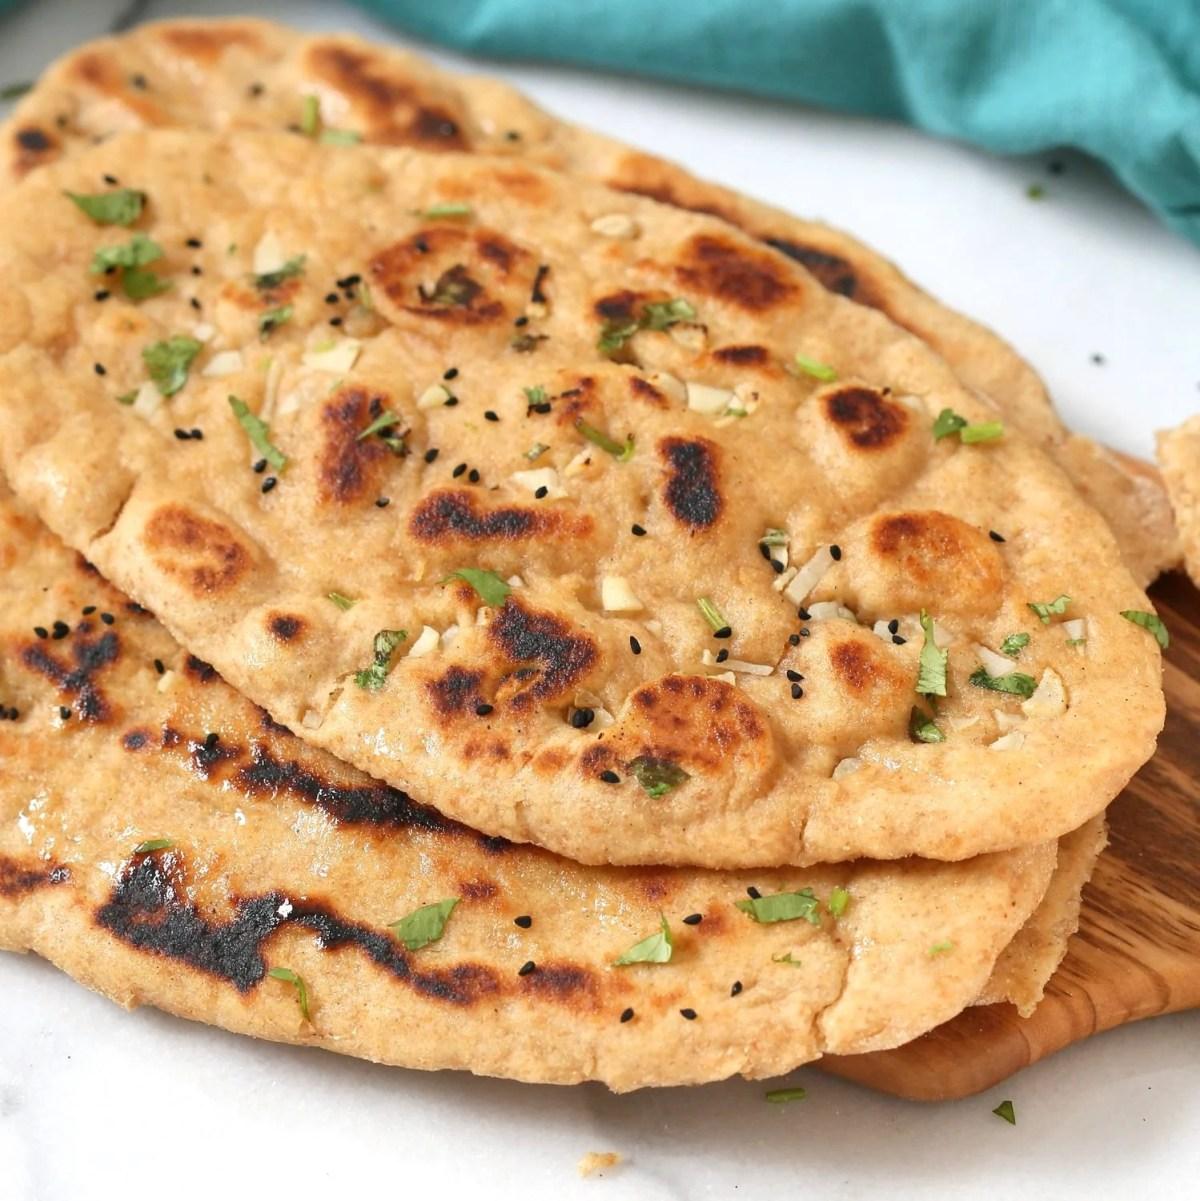 Whole Wheat Naan Bread. Soft, Amazing 100% Whole Grain Naan flatbread. Butter Naan Recipe. #Vegan #Soyfree #Nutfree #Recipe #veganricha | VeganRicha.com